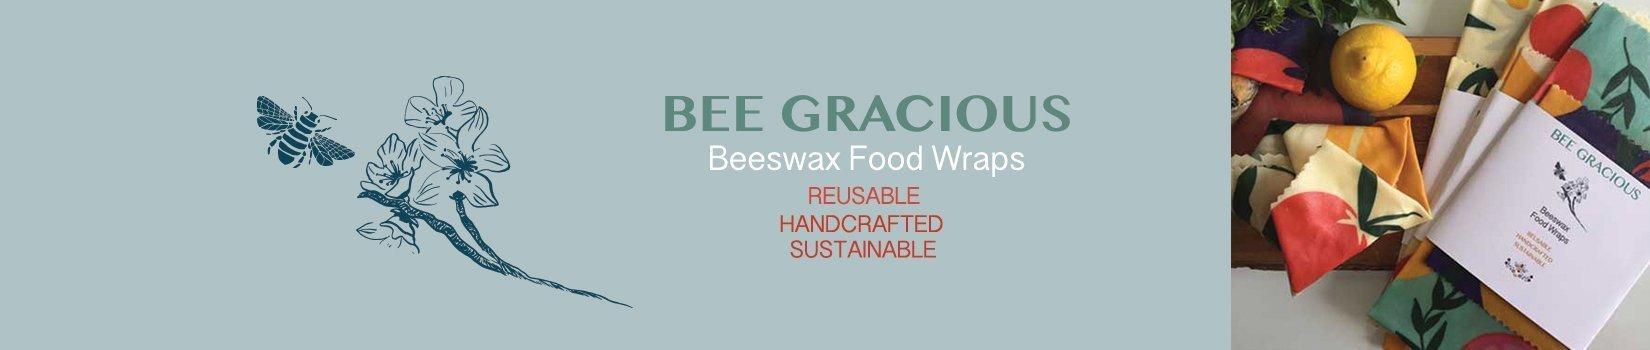 Bee Gracious